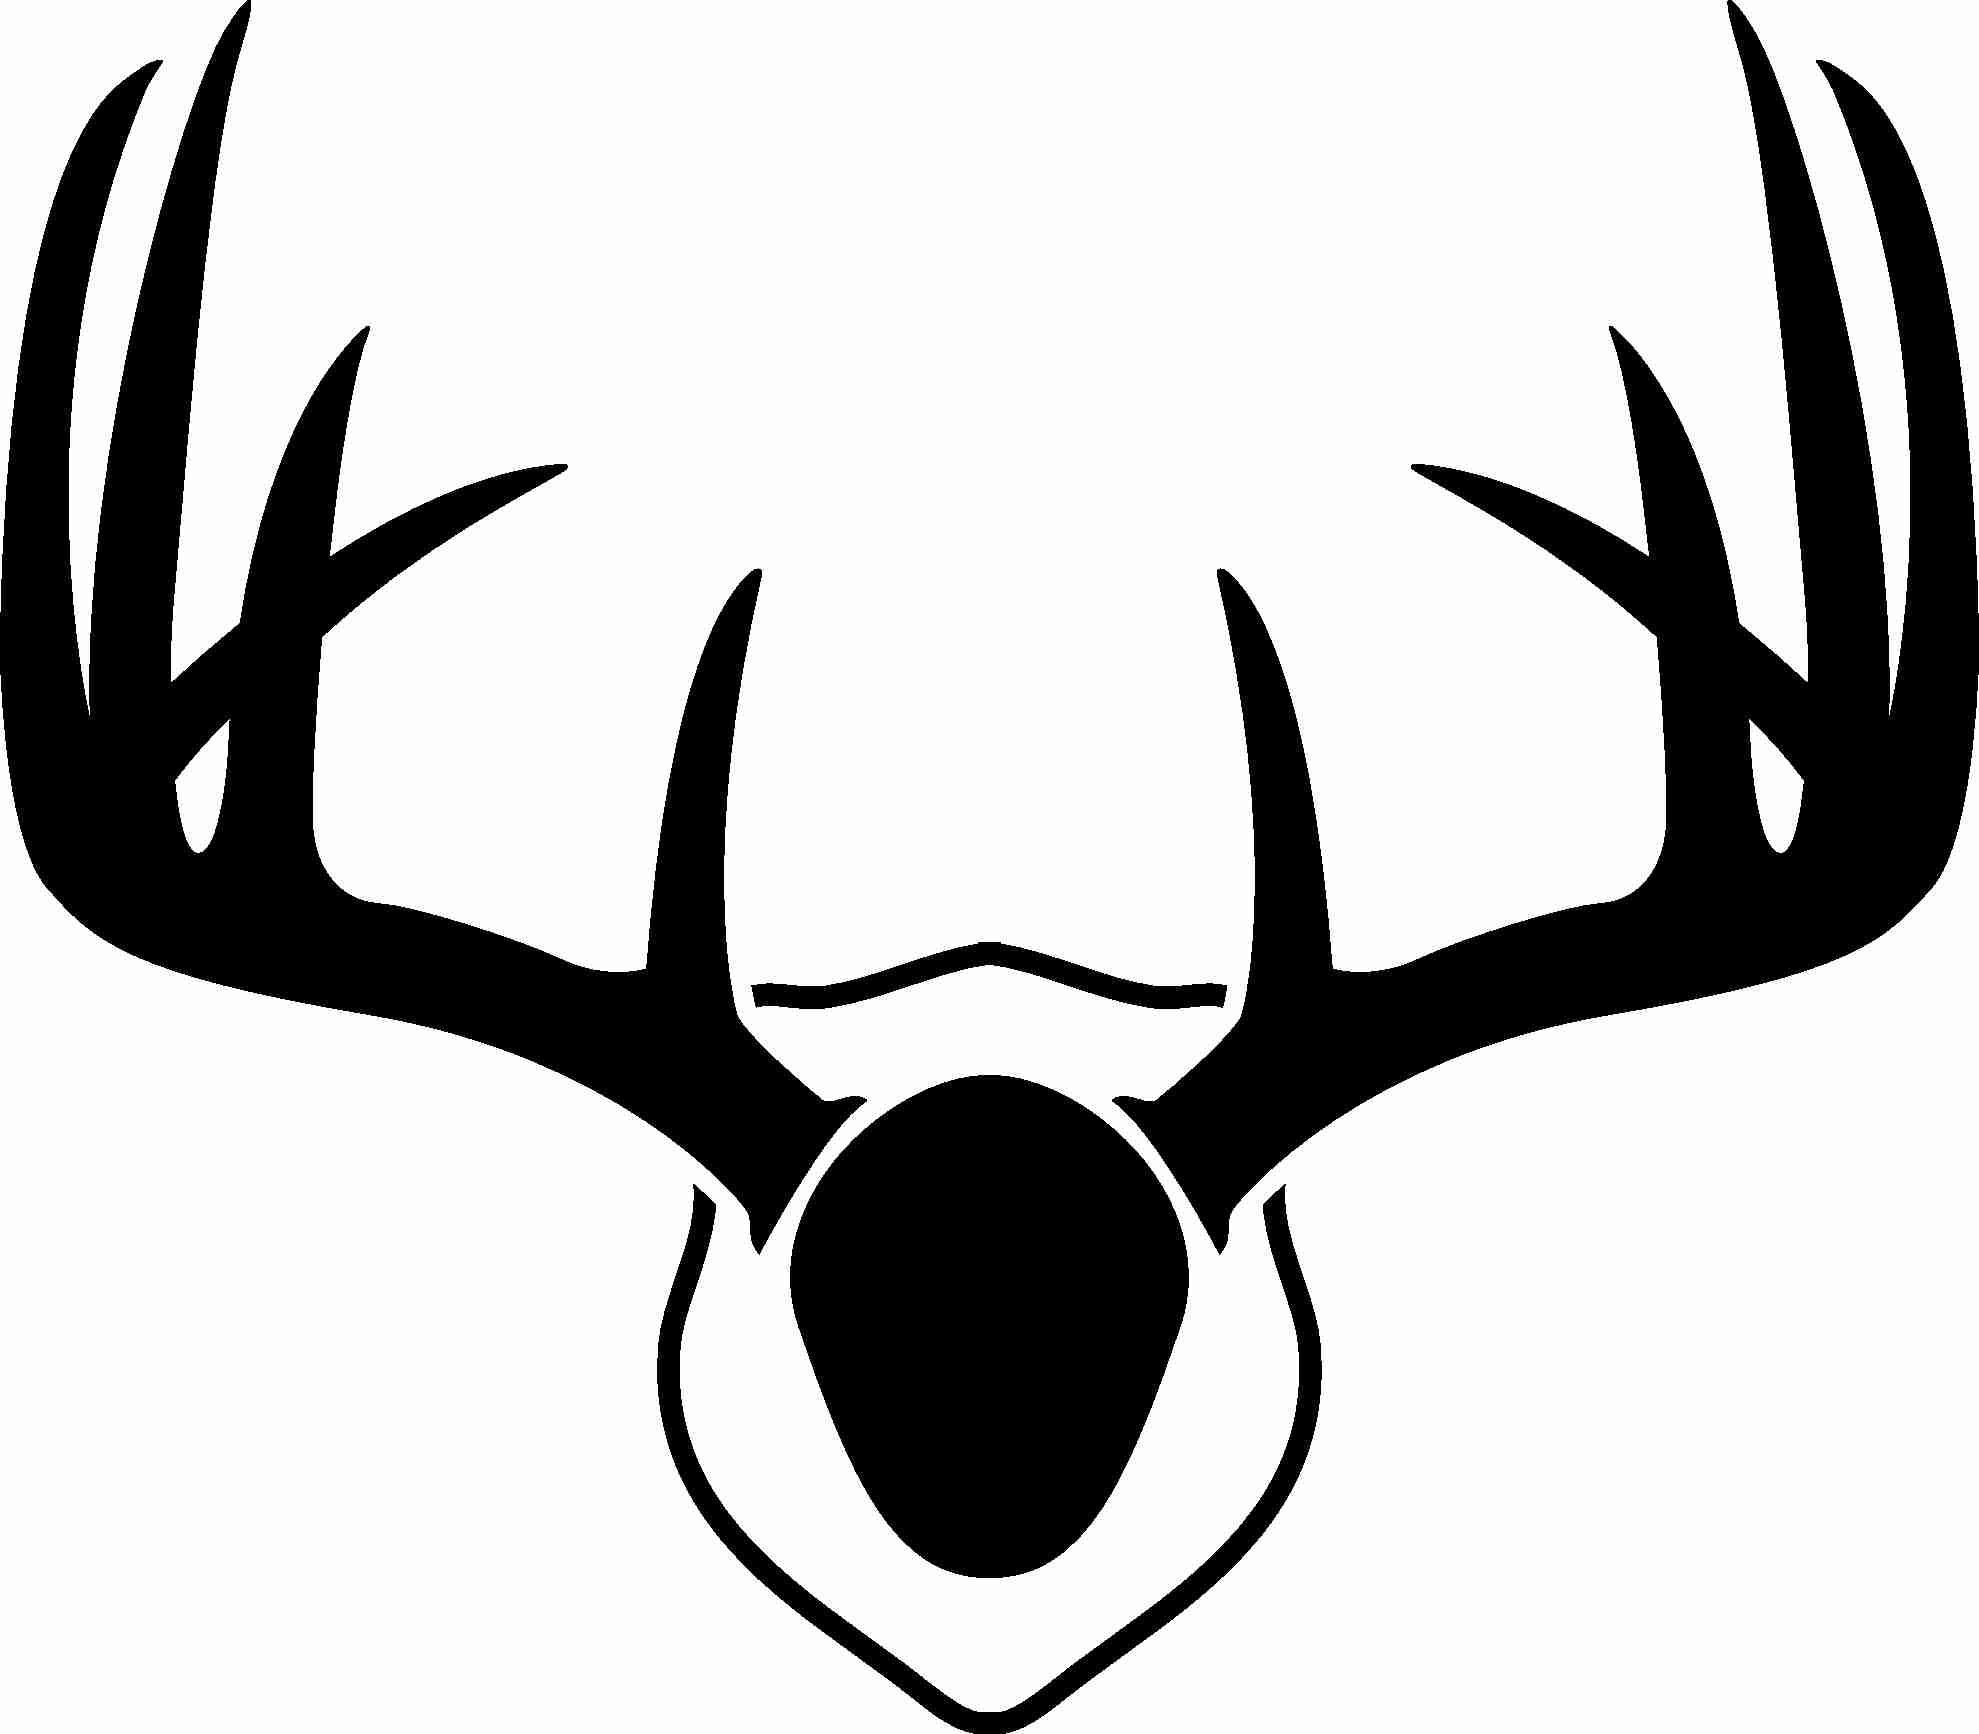 1979x1734 Deer Antler Head Silhouette Clipart Svg Free Brilliant Antlers